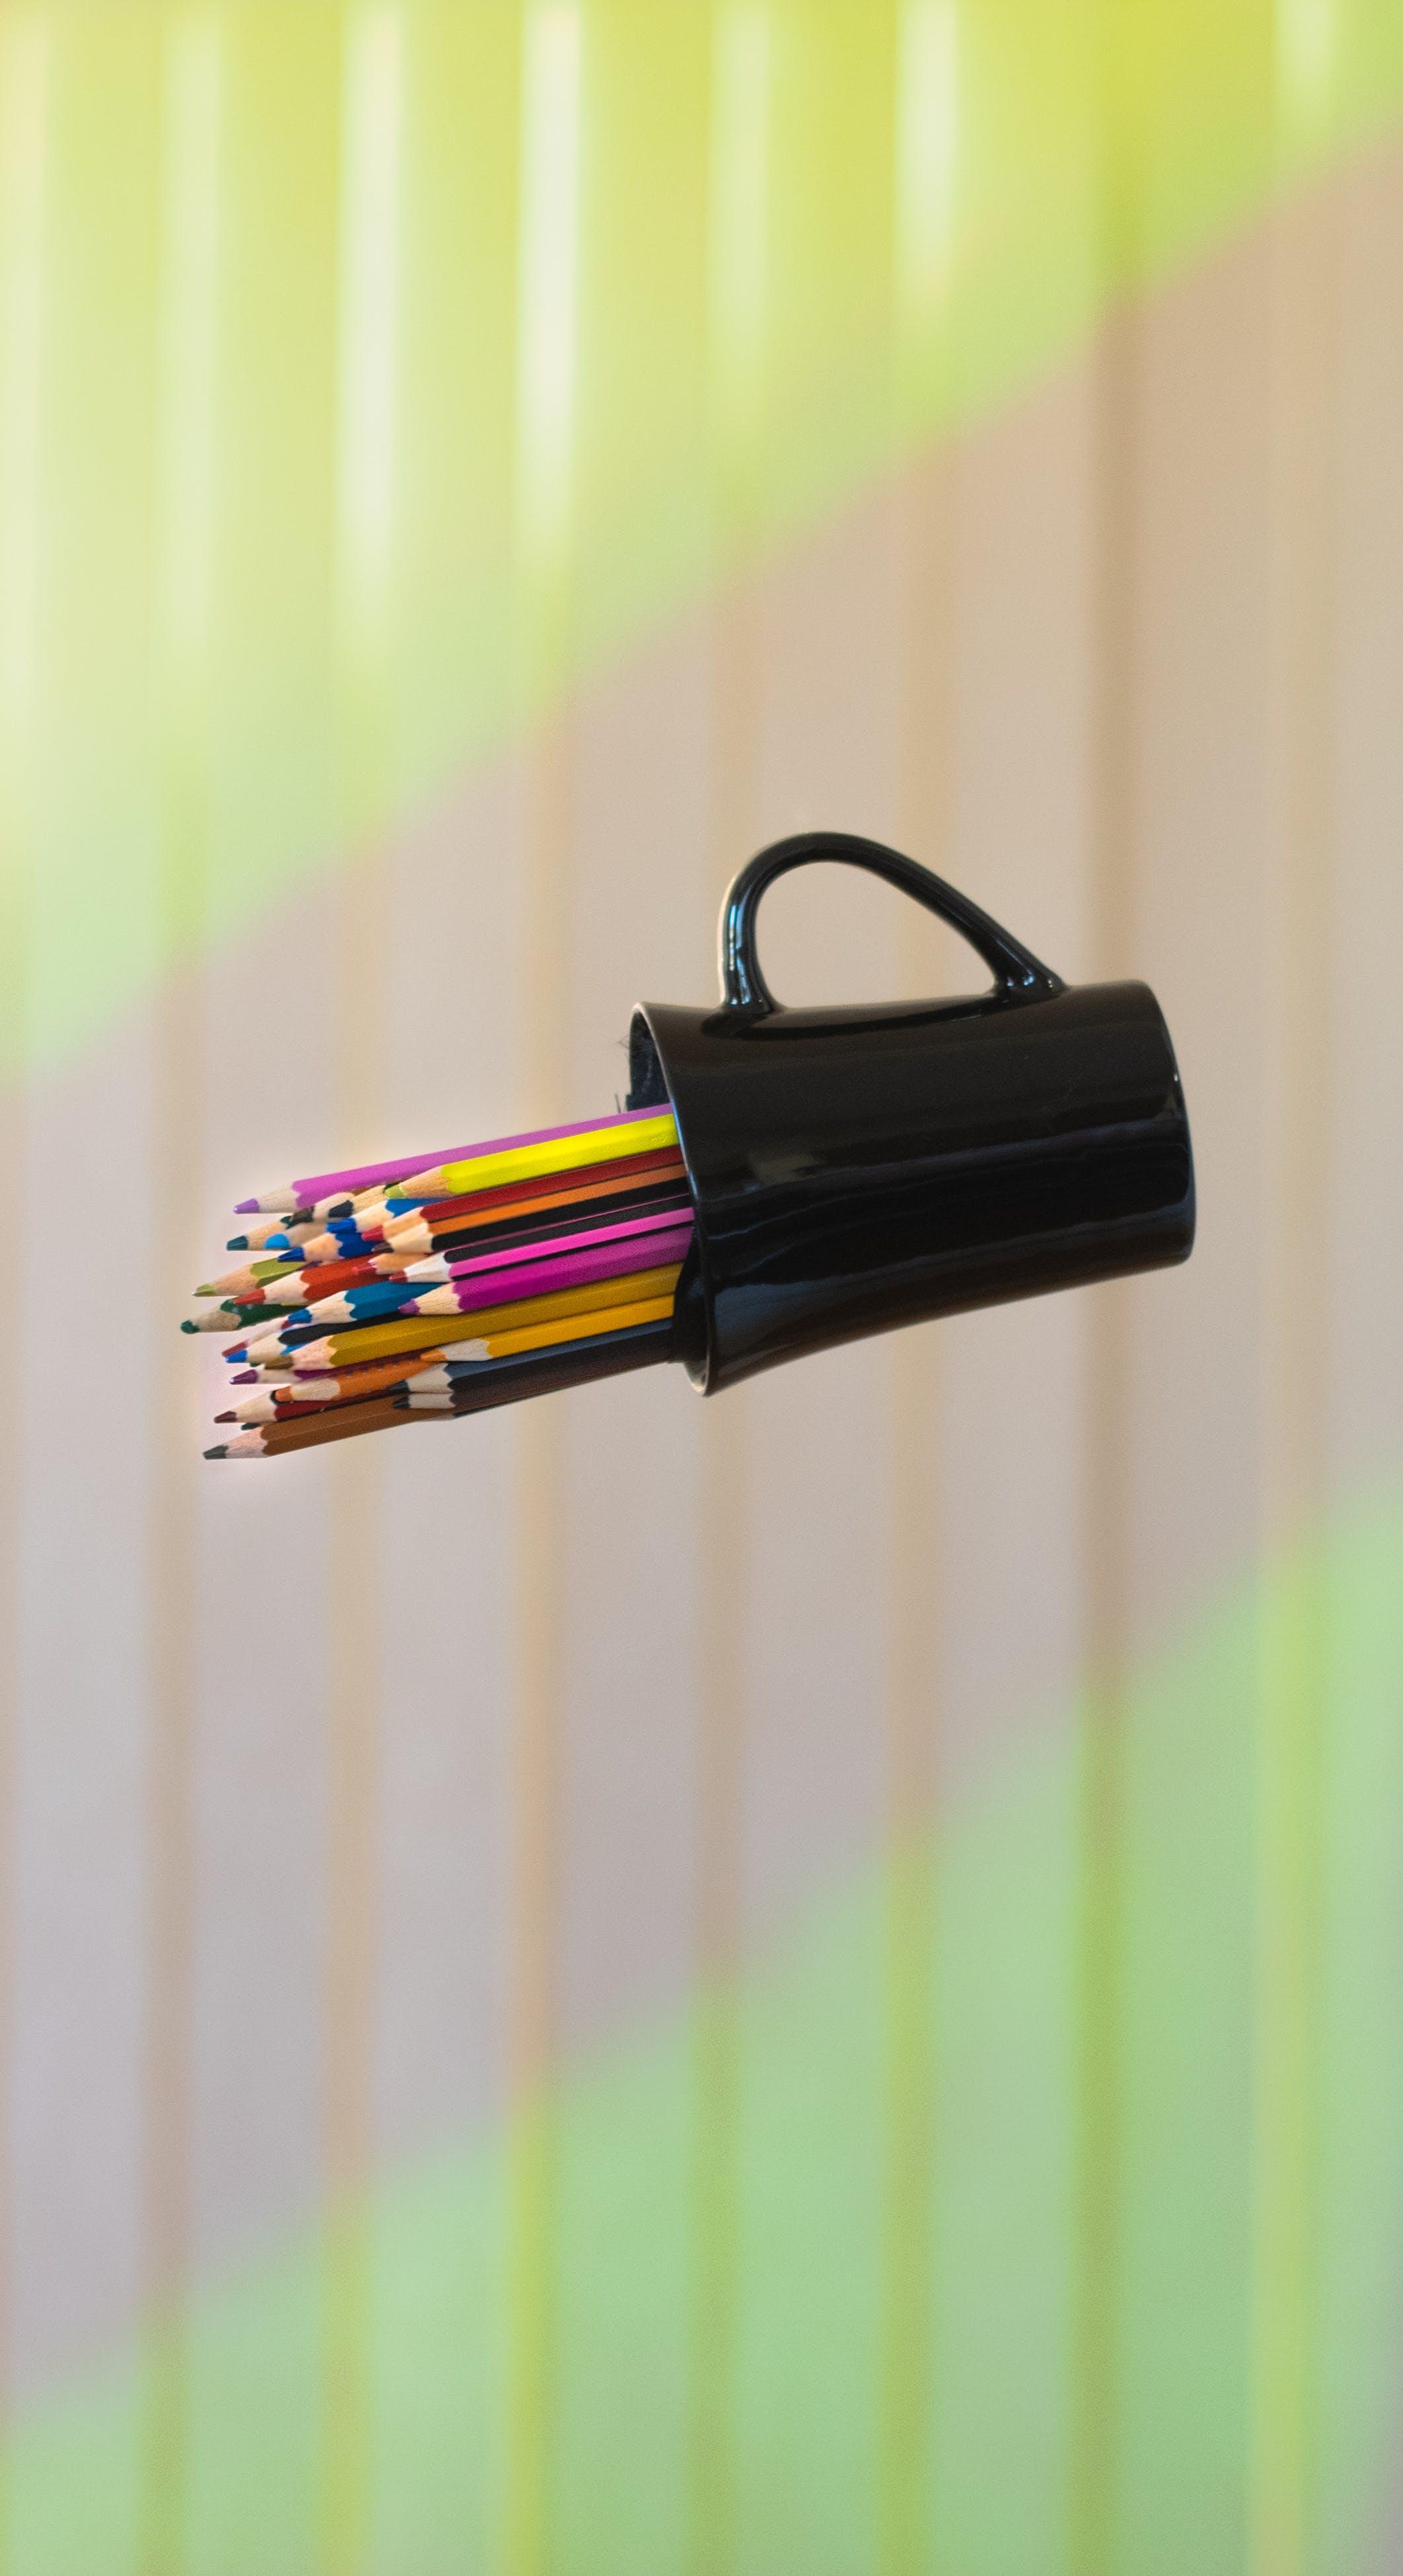 Free stock photo of artistic, black mug, coffee mug, coloured pencils